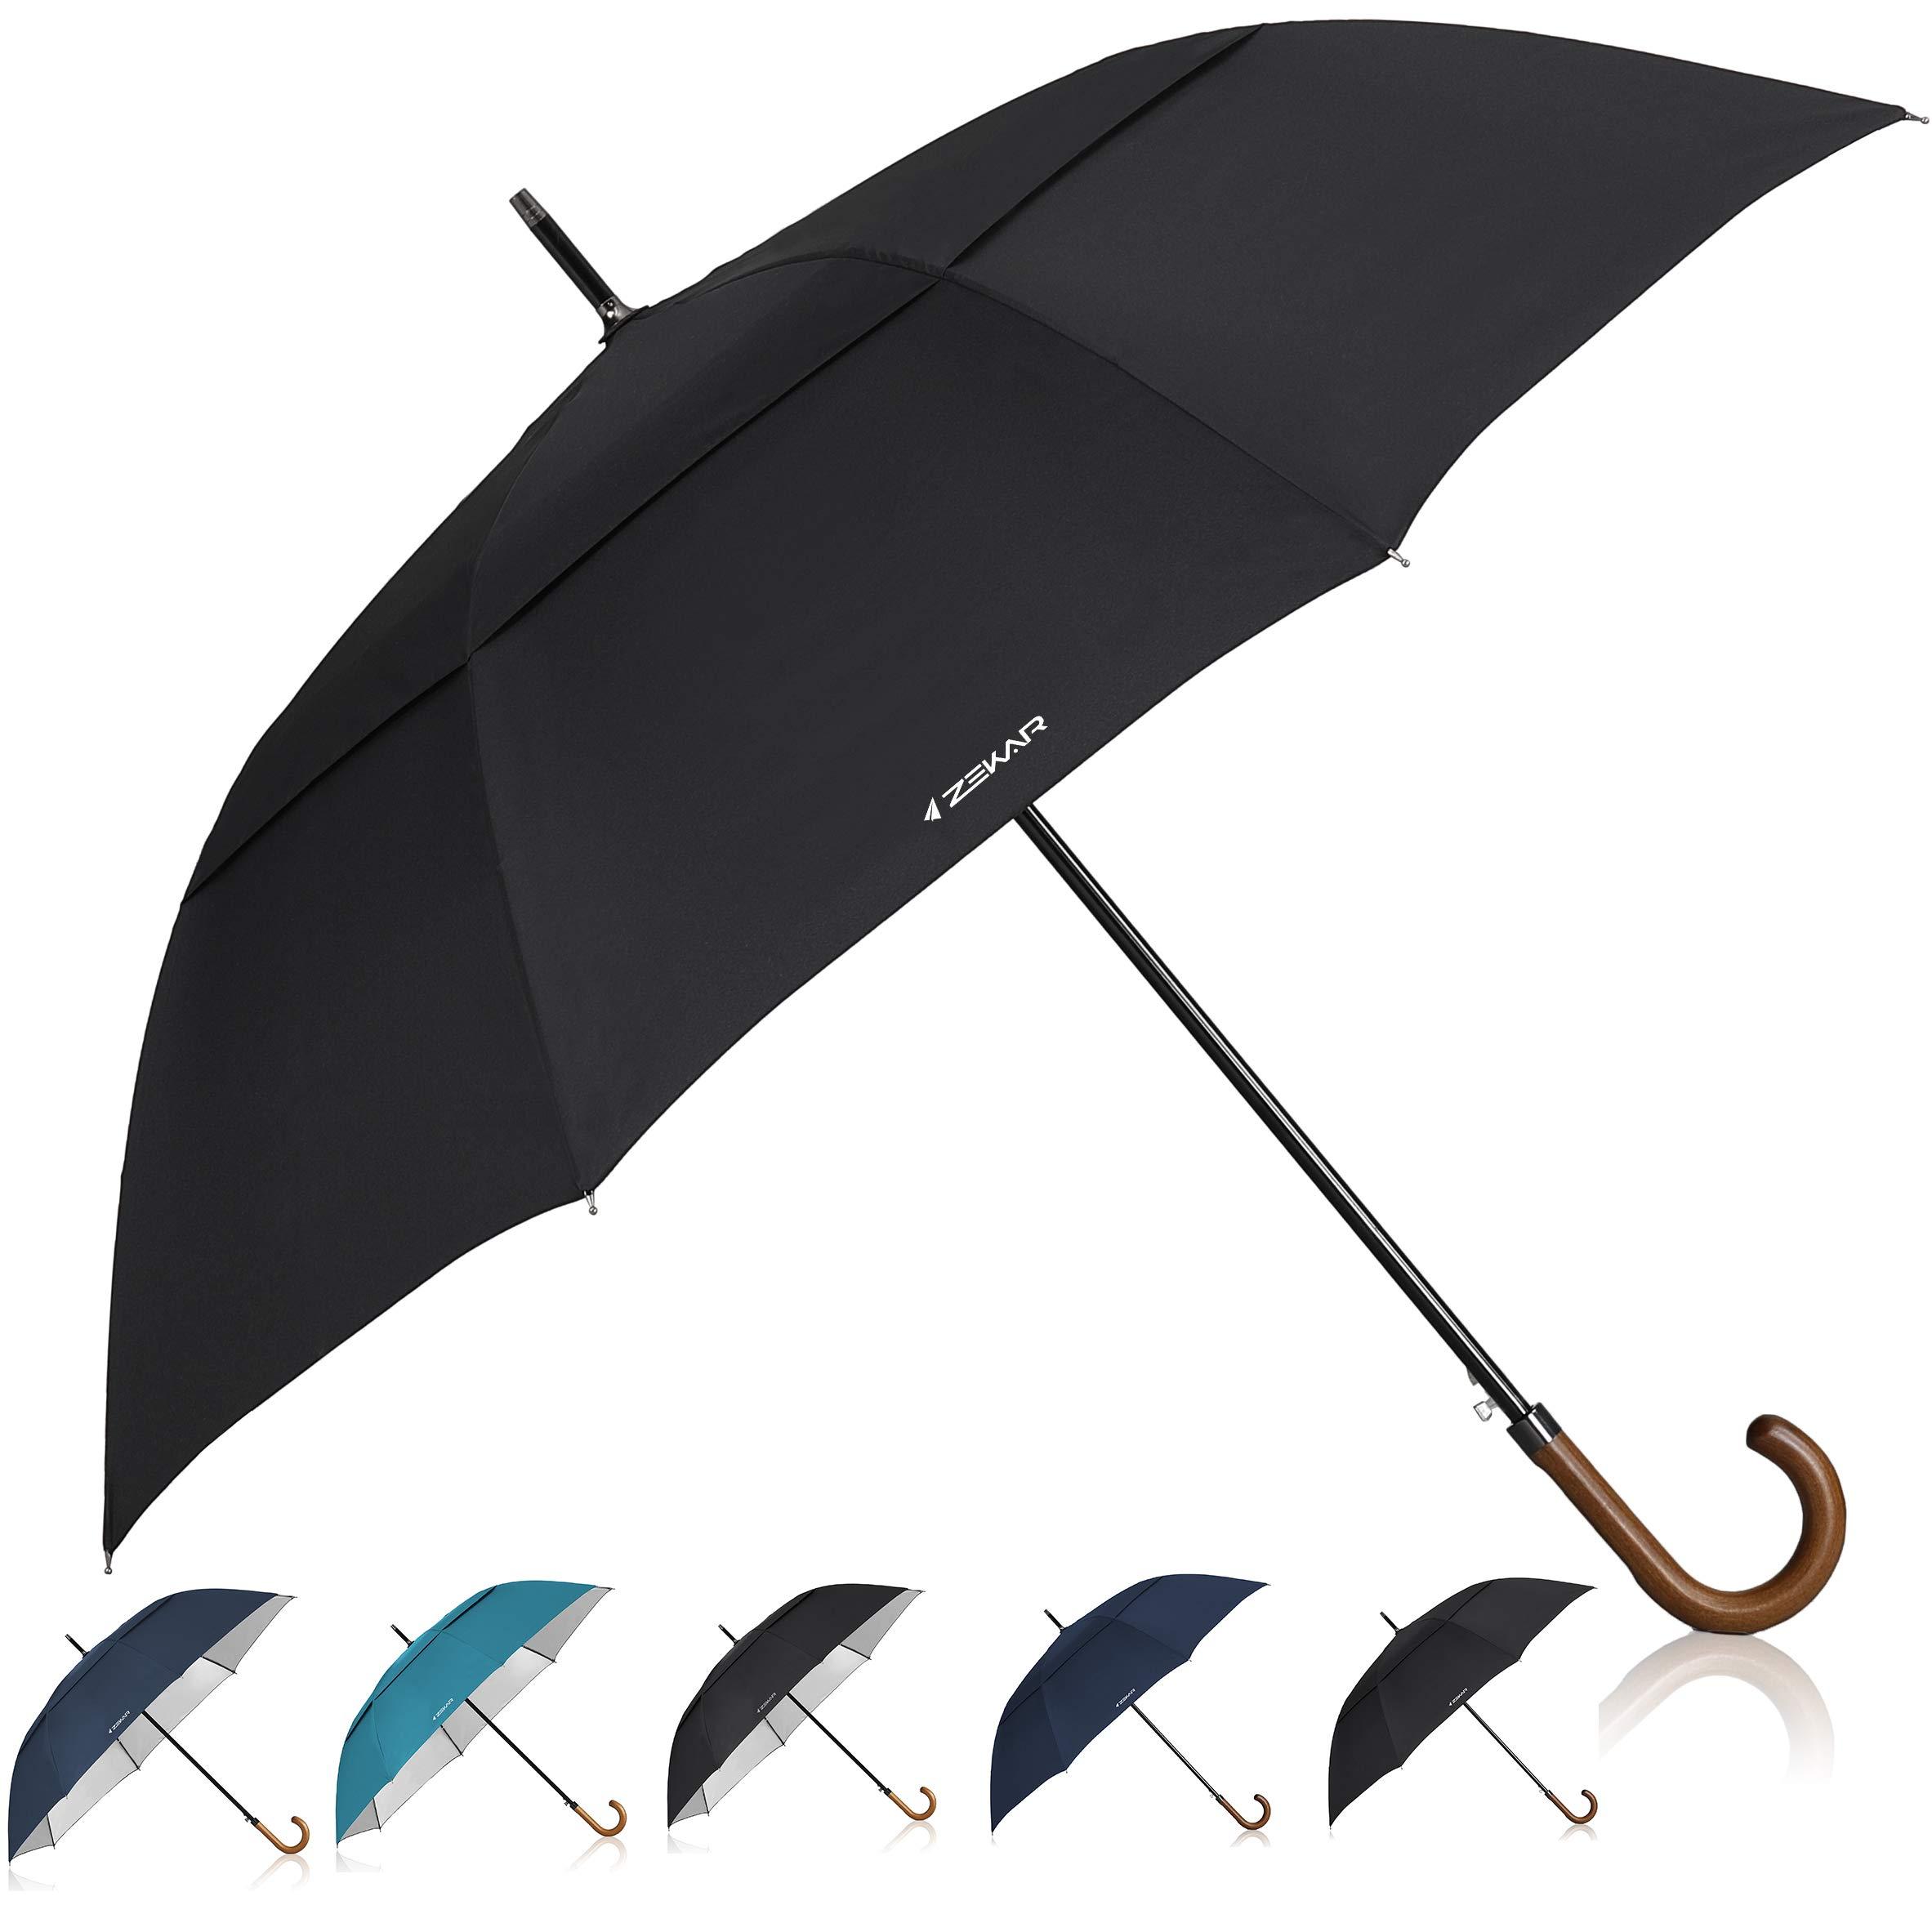 ZEKAR 60 inch Wooden J Handle Golf Umbrella, Classic Double Canopy Windproof Large Auto Open Rain Stick Umbrellas (60inch-Black)